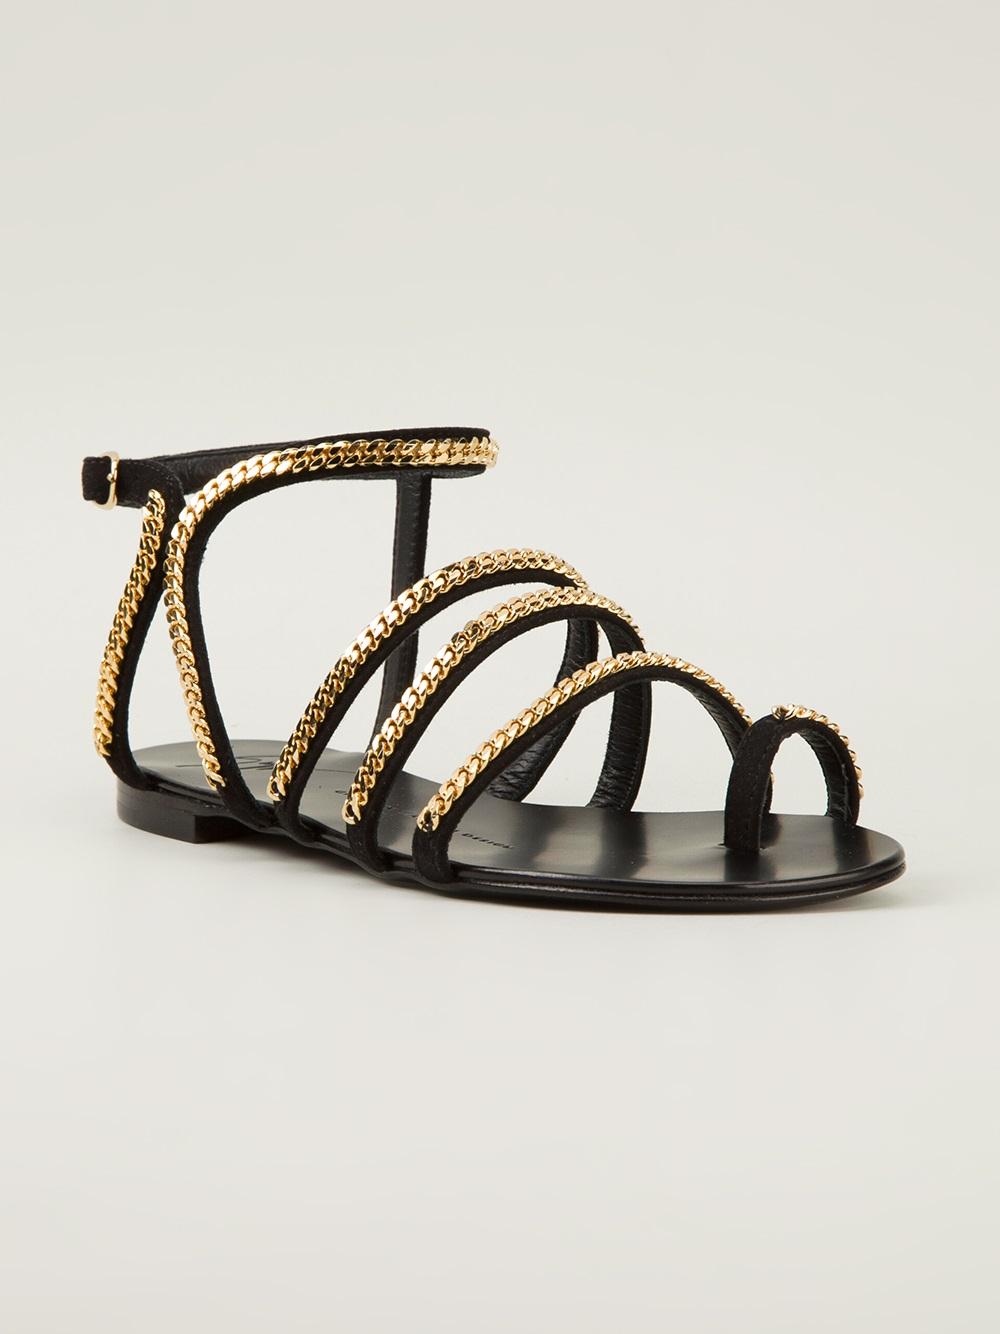 Giuseppe Zanotti Chain Embellished Sandals In Gold Black